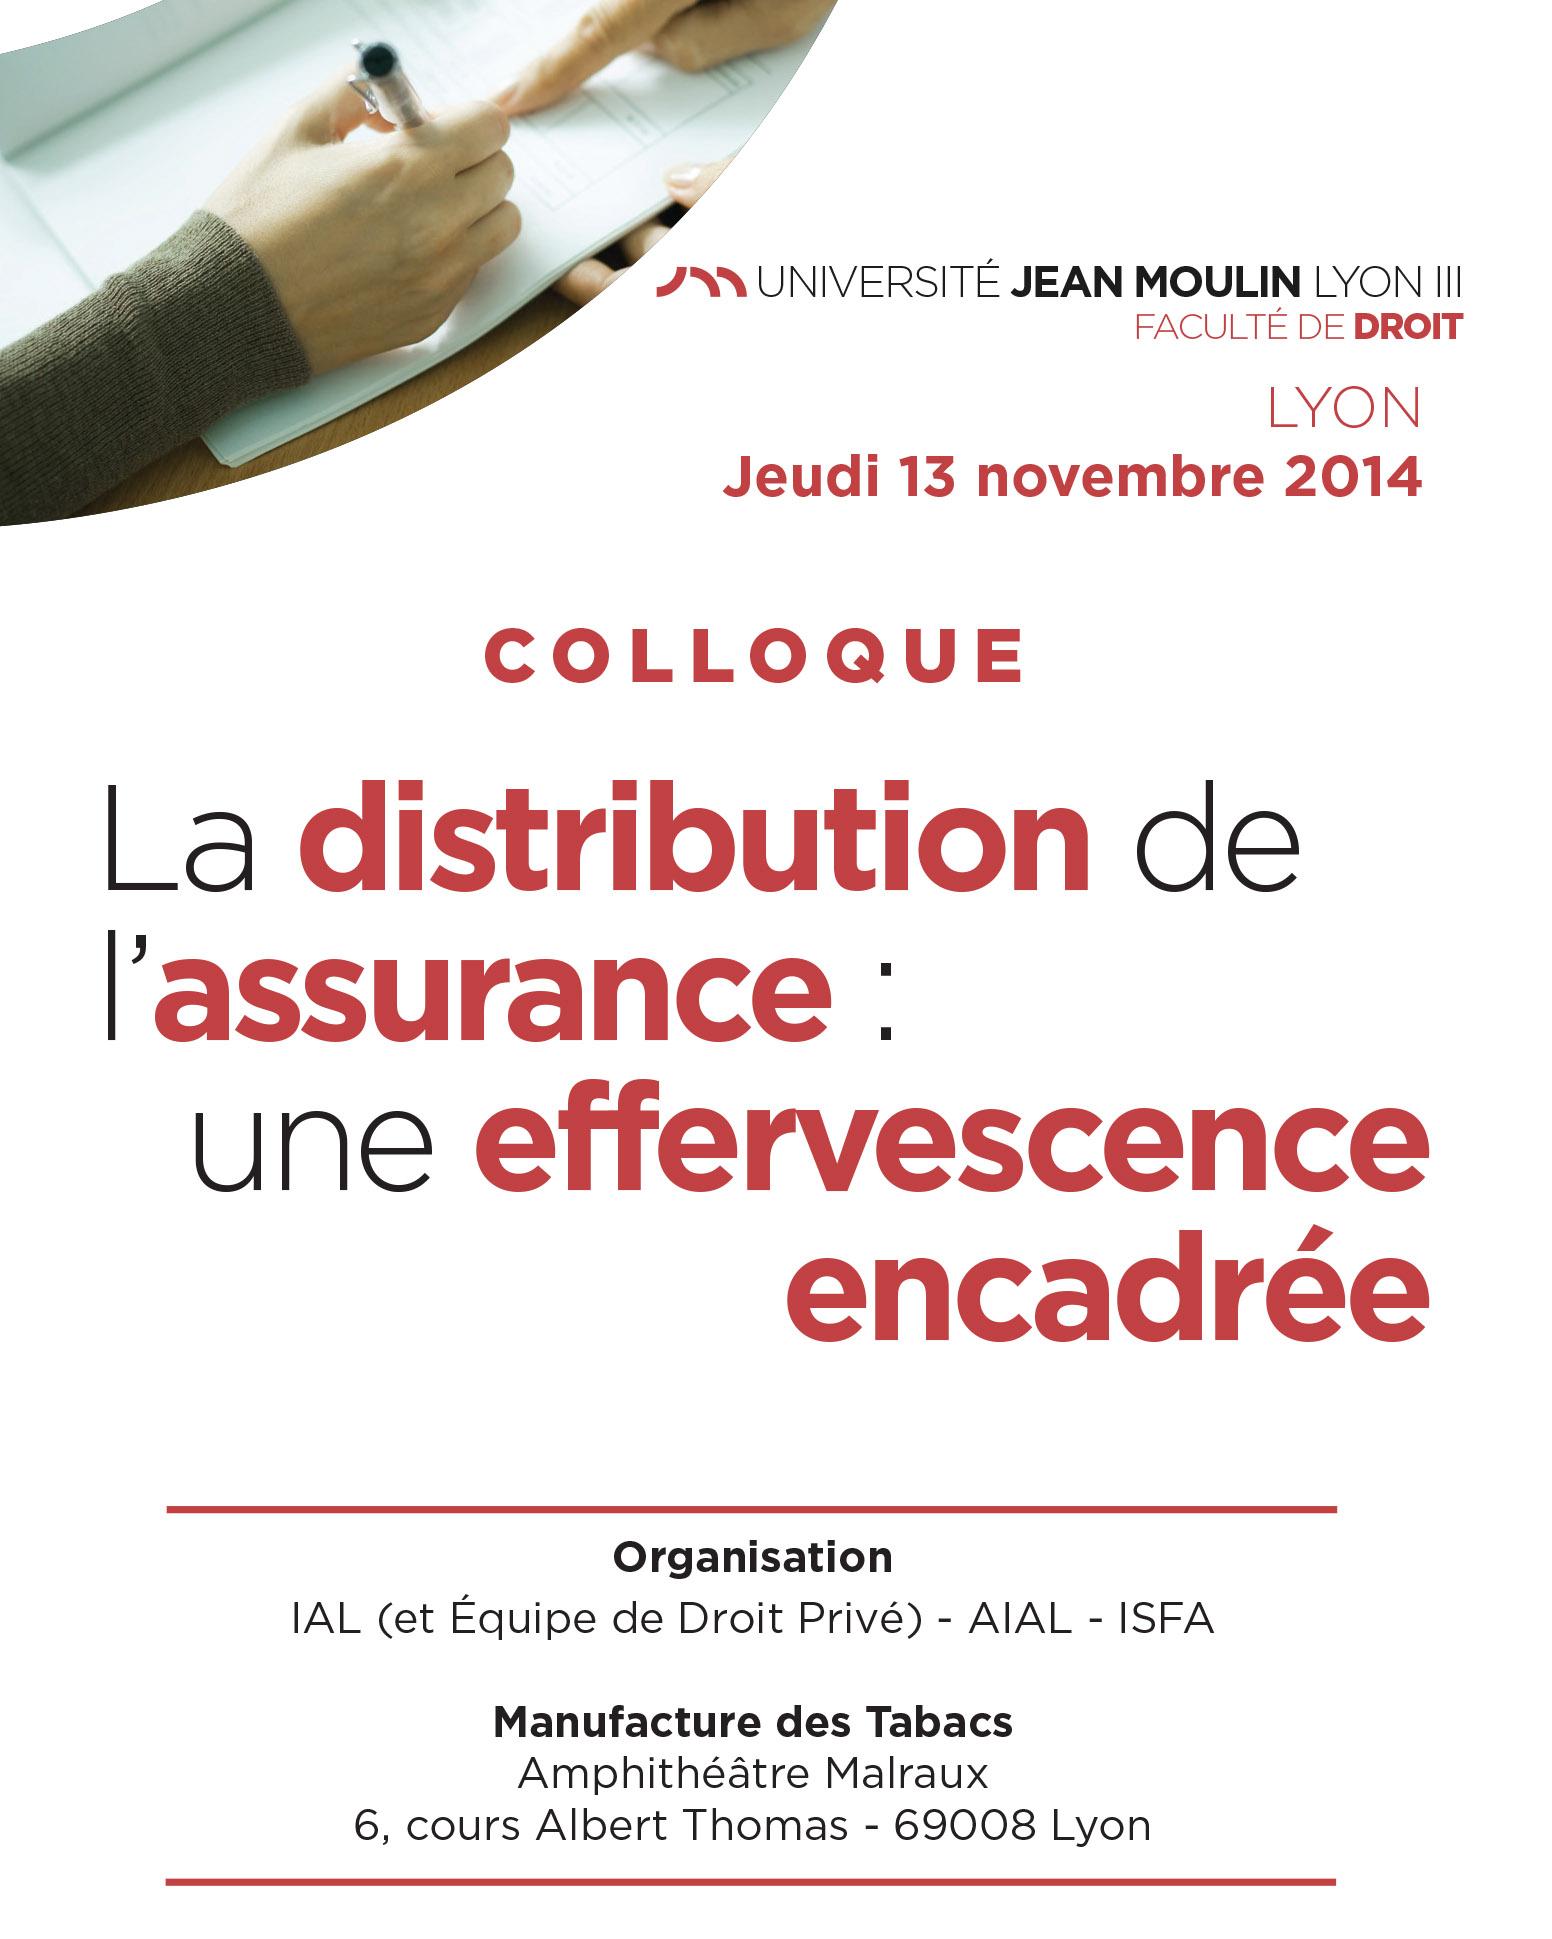 Colloque IAL : La distribution de l'assurance